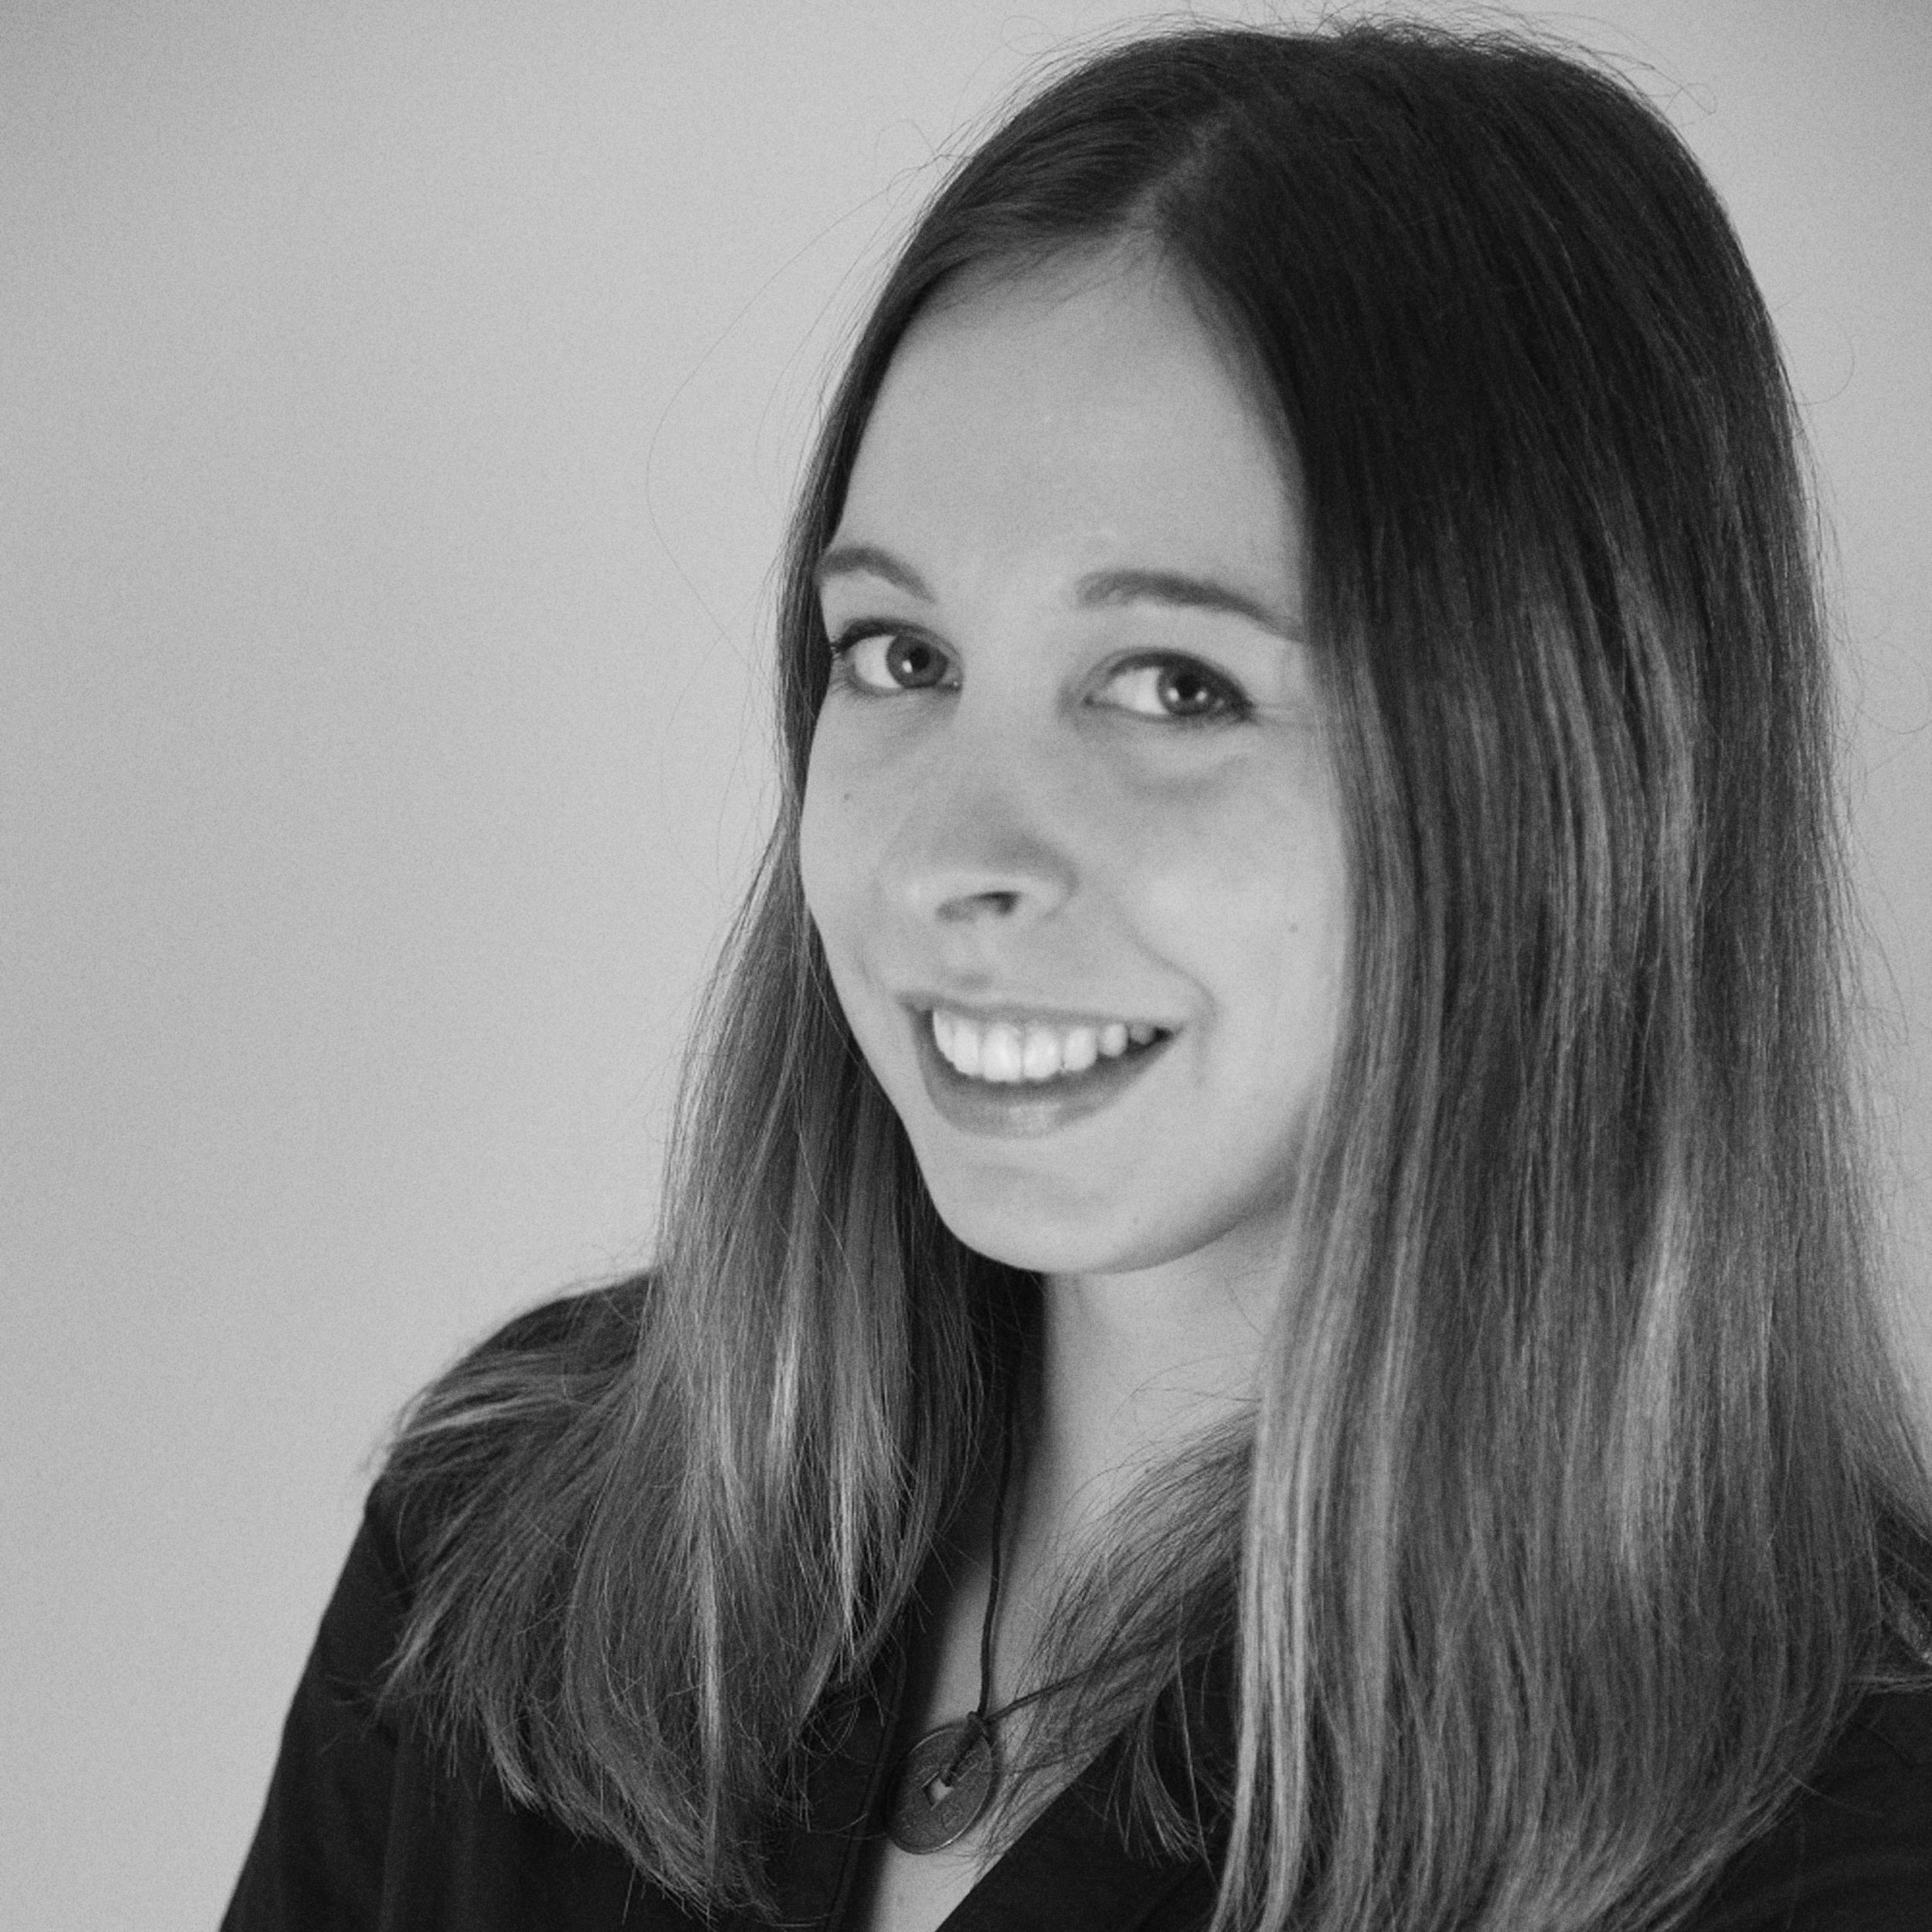 Samira-Eileen-Blankestijn_Profilbild_2500.jpg